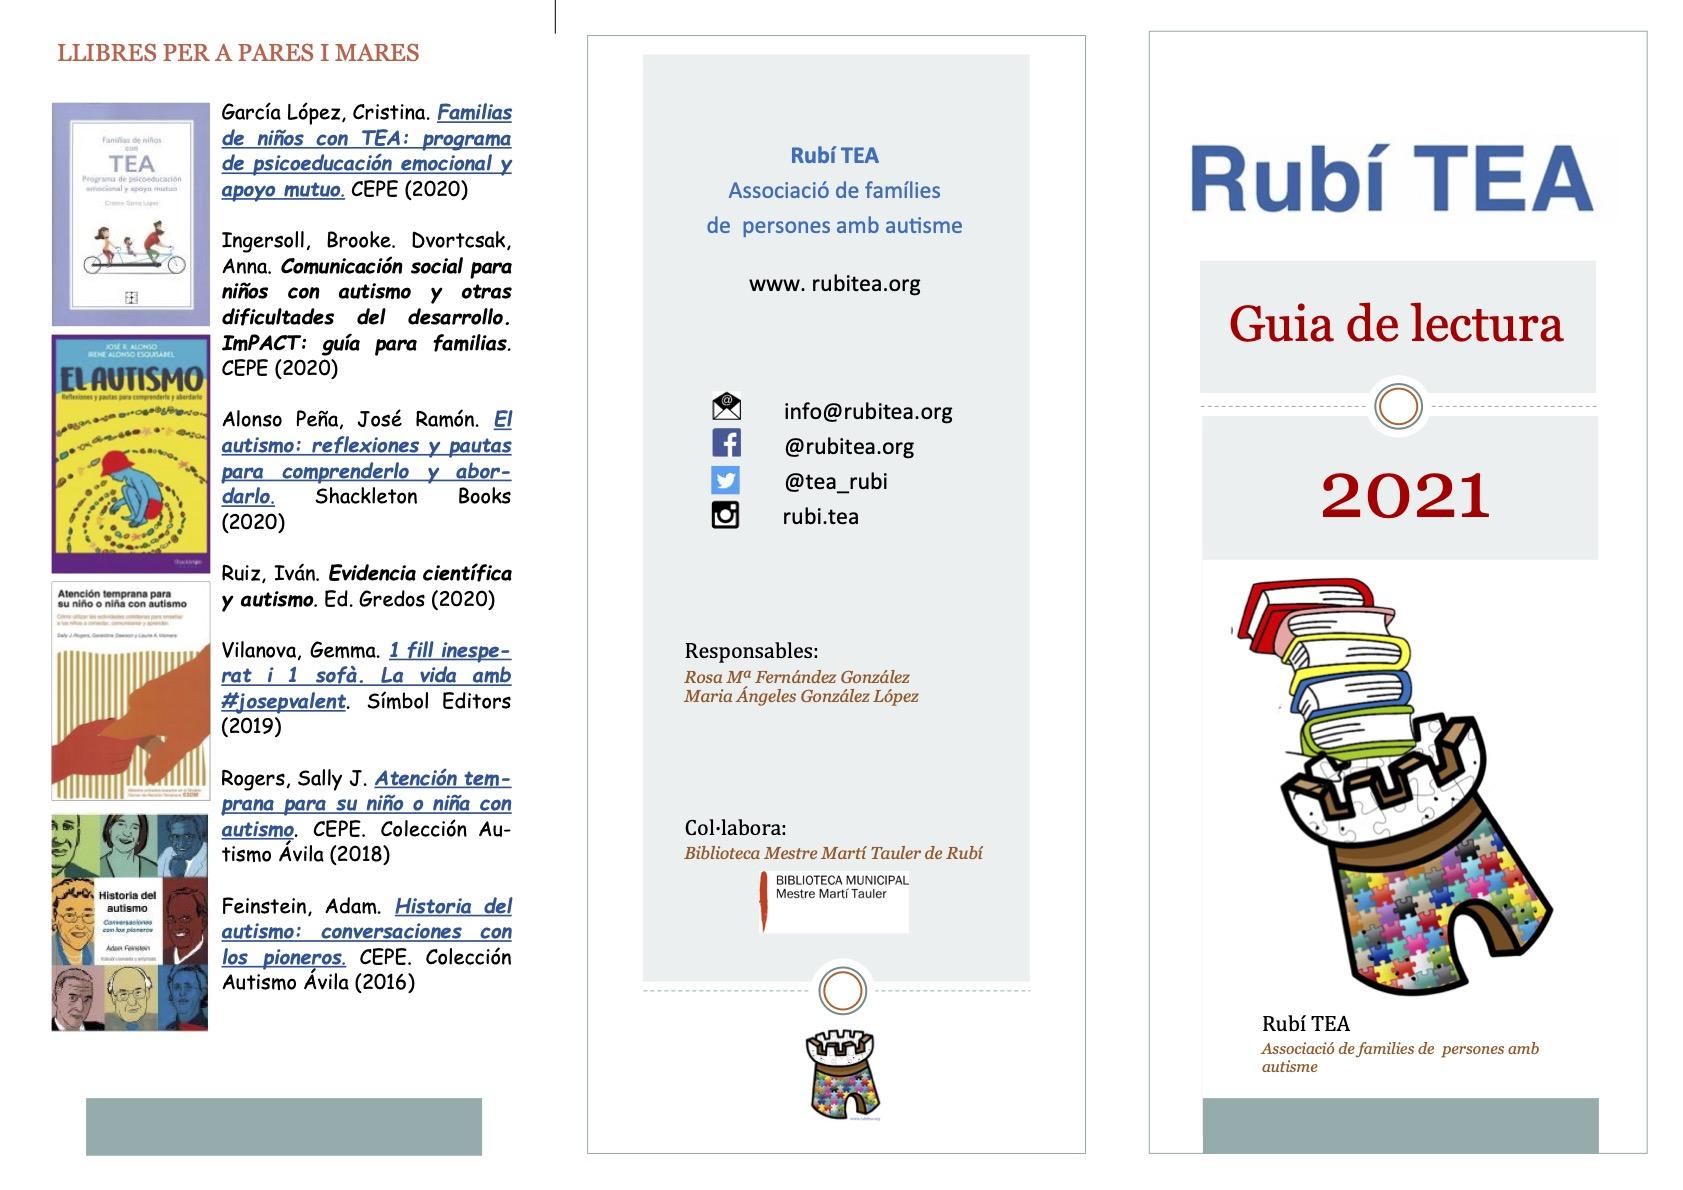 guia de lectura rubitea